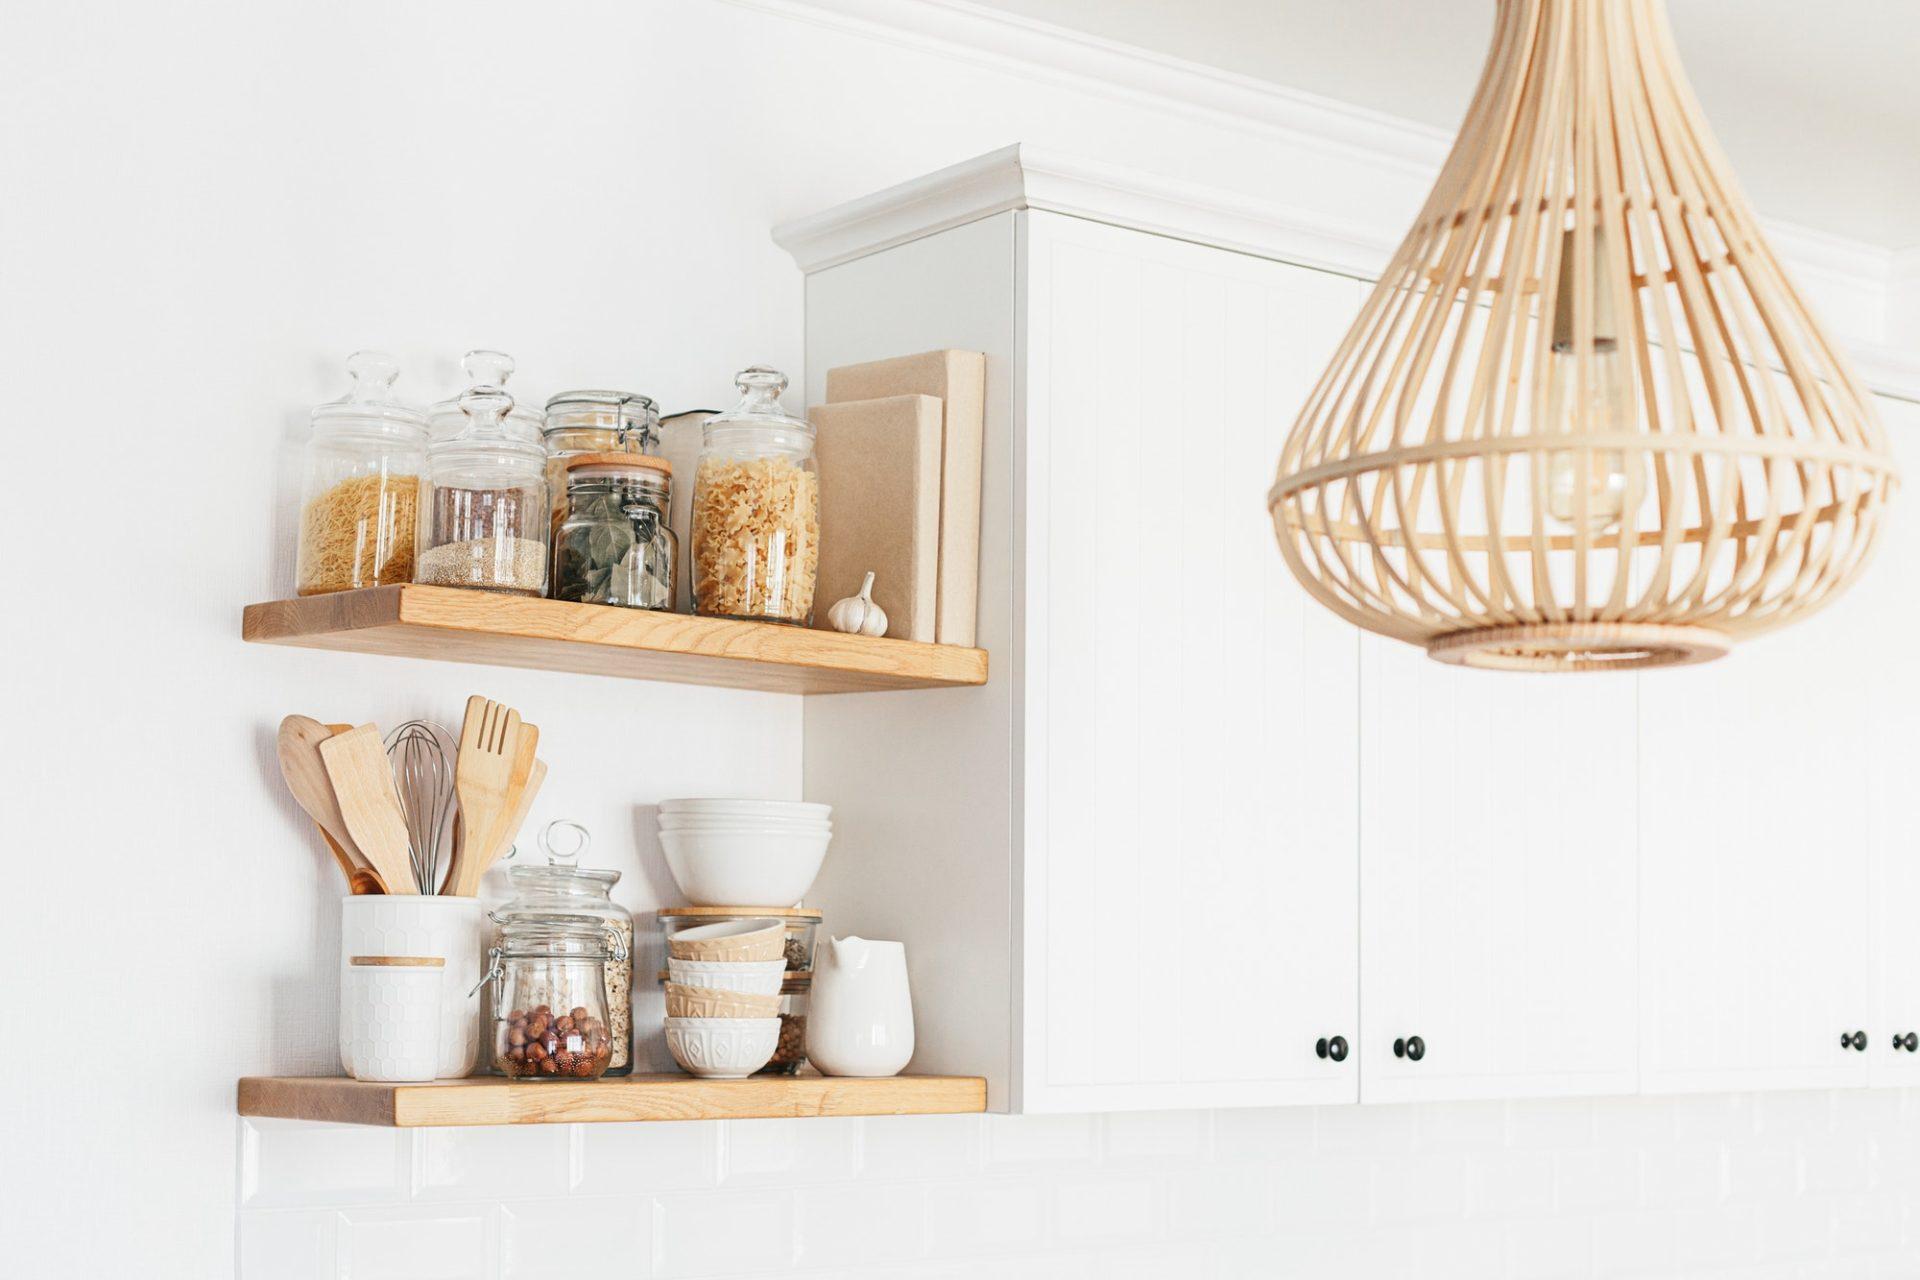 Eco friendly kitchen, zero waste home concept